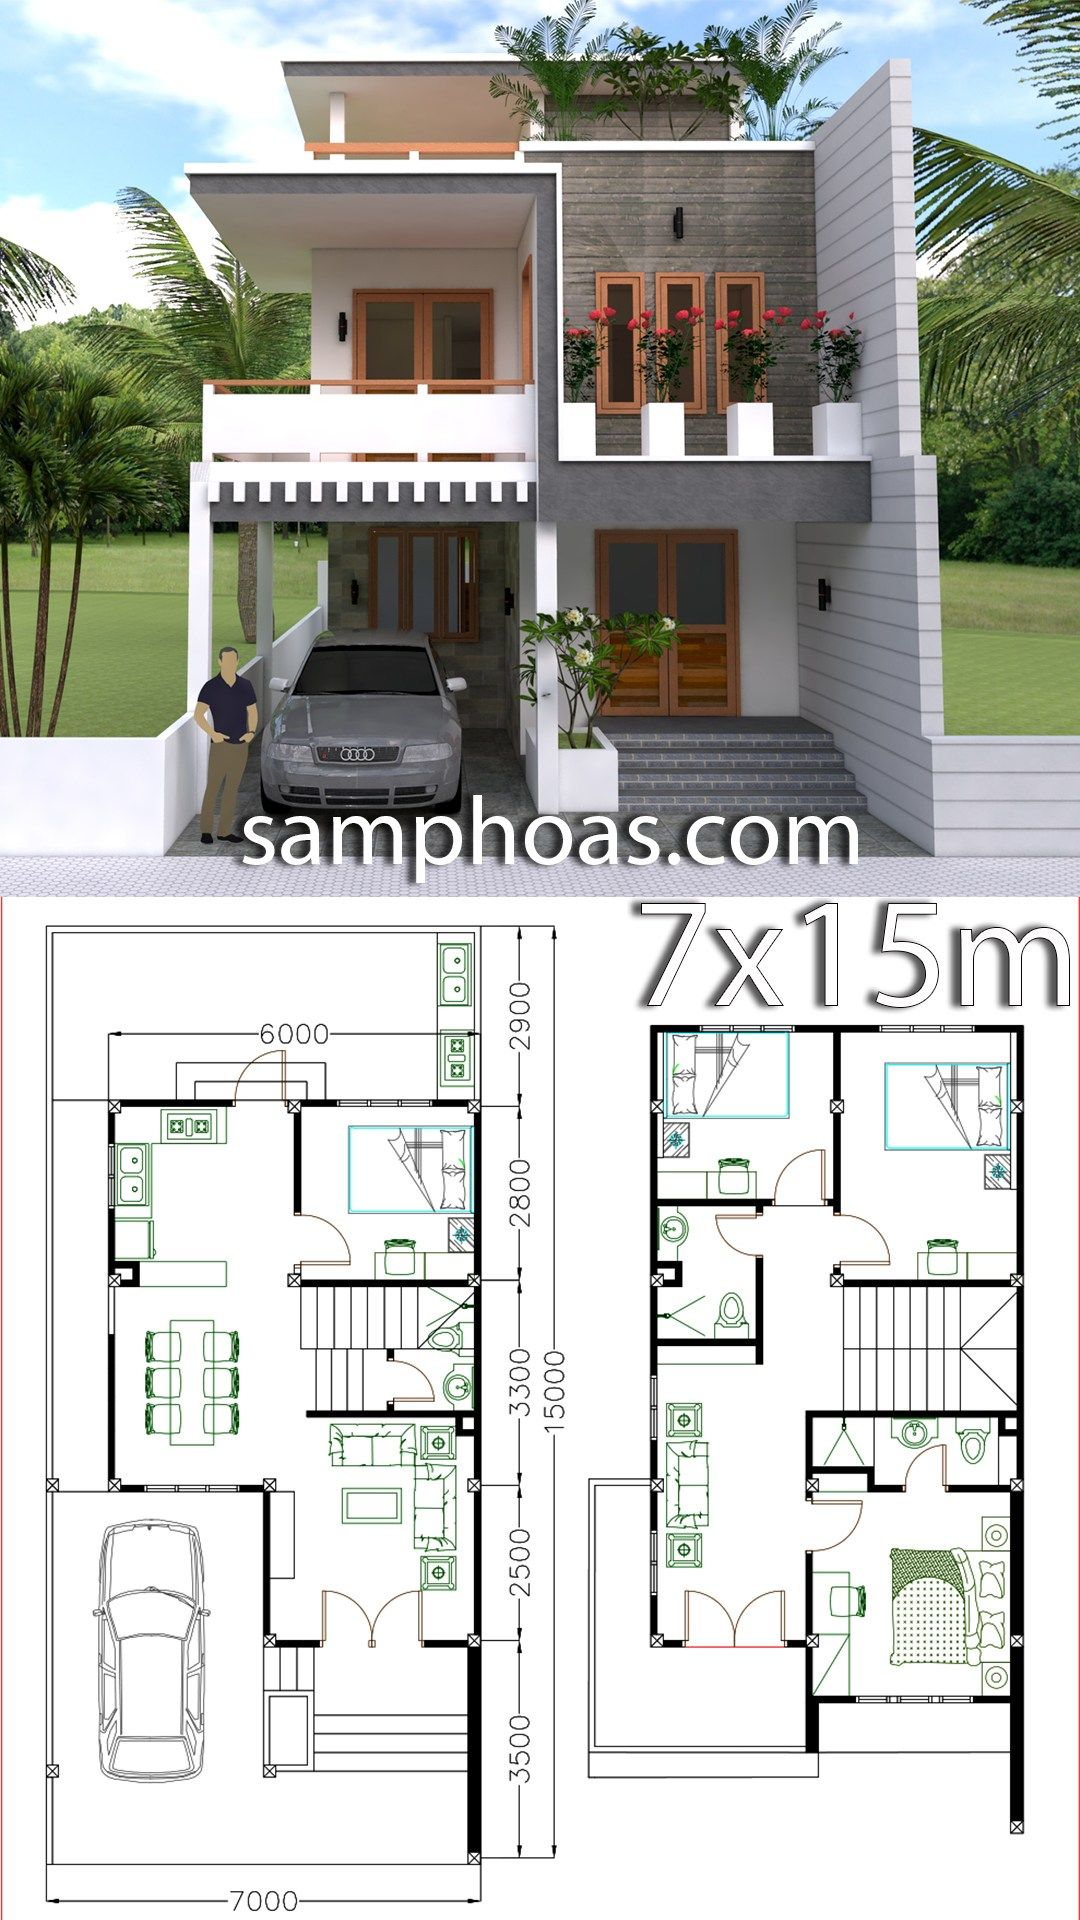 Home Design Plan 7x15m With 4 Bedrooms Samphoas Plan Modern House Plans Architecture House Duplex House Design